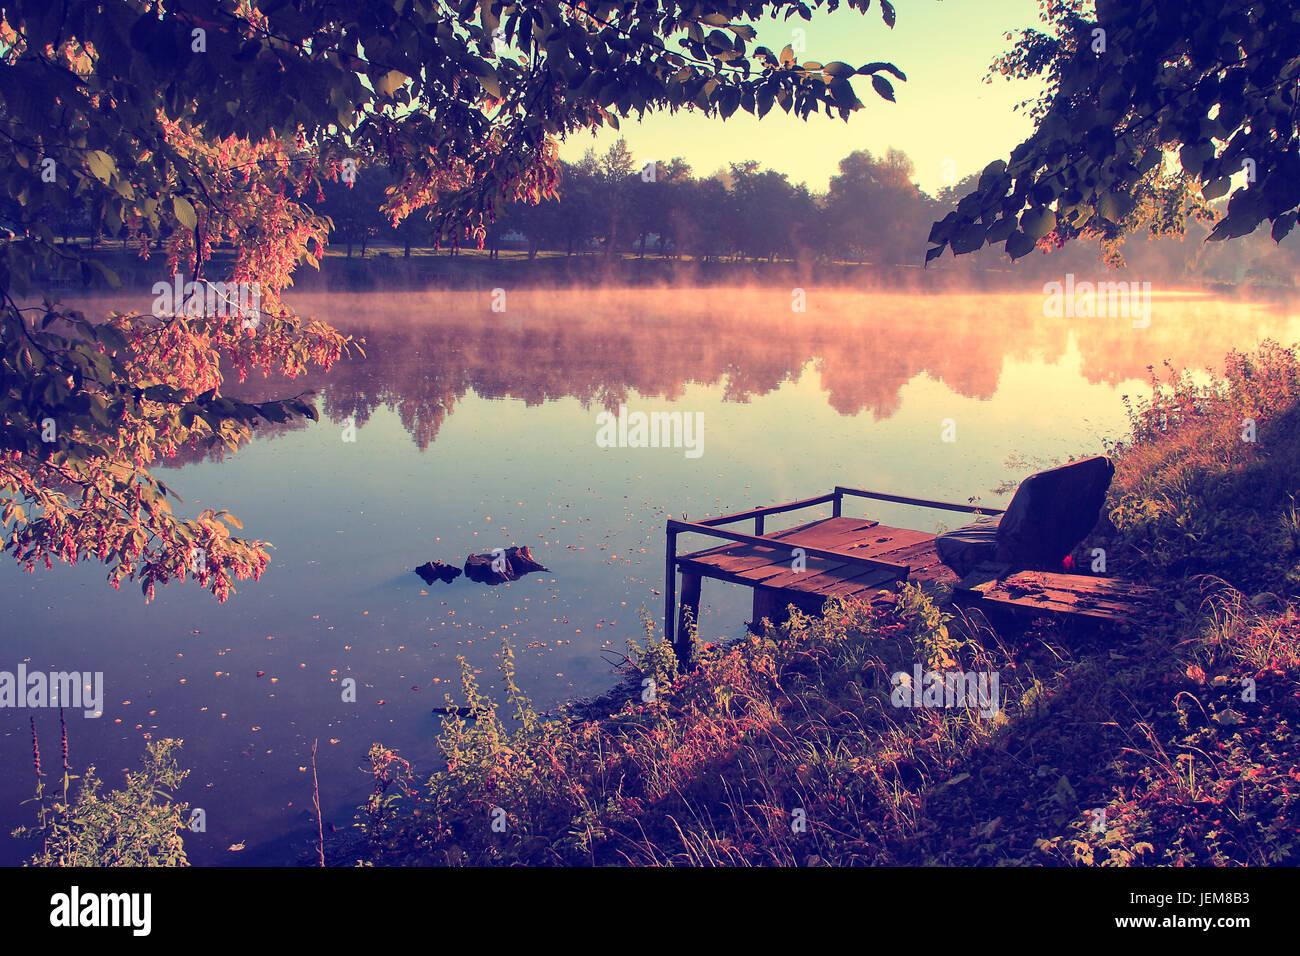 Vintage photo of autumn scene - Stock Image